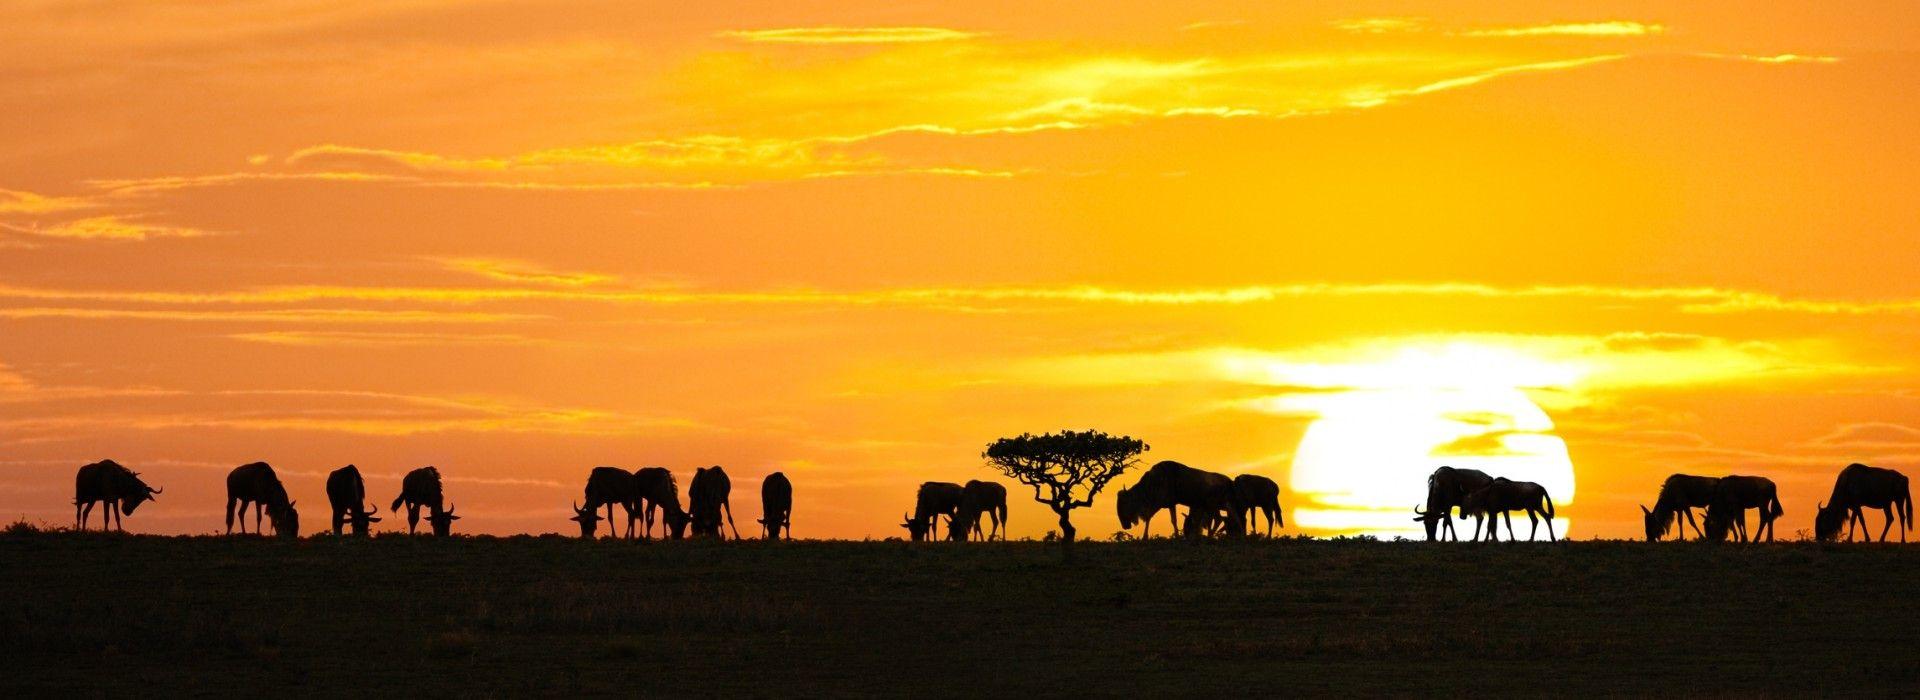 Trekking Tours in Tanzania